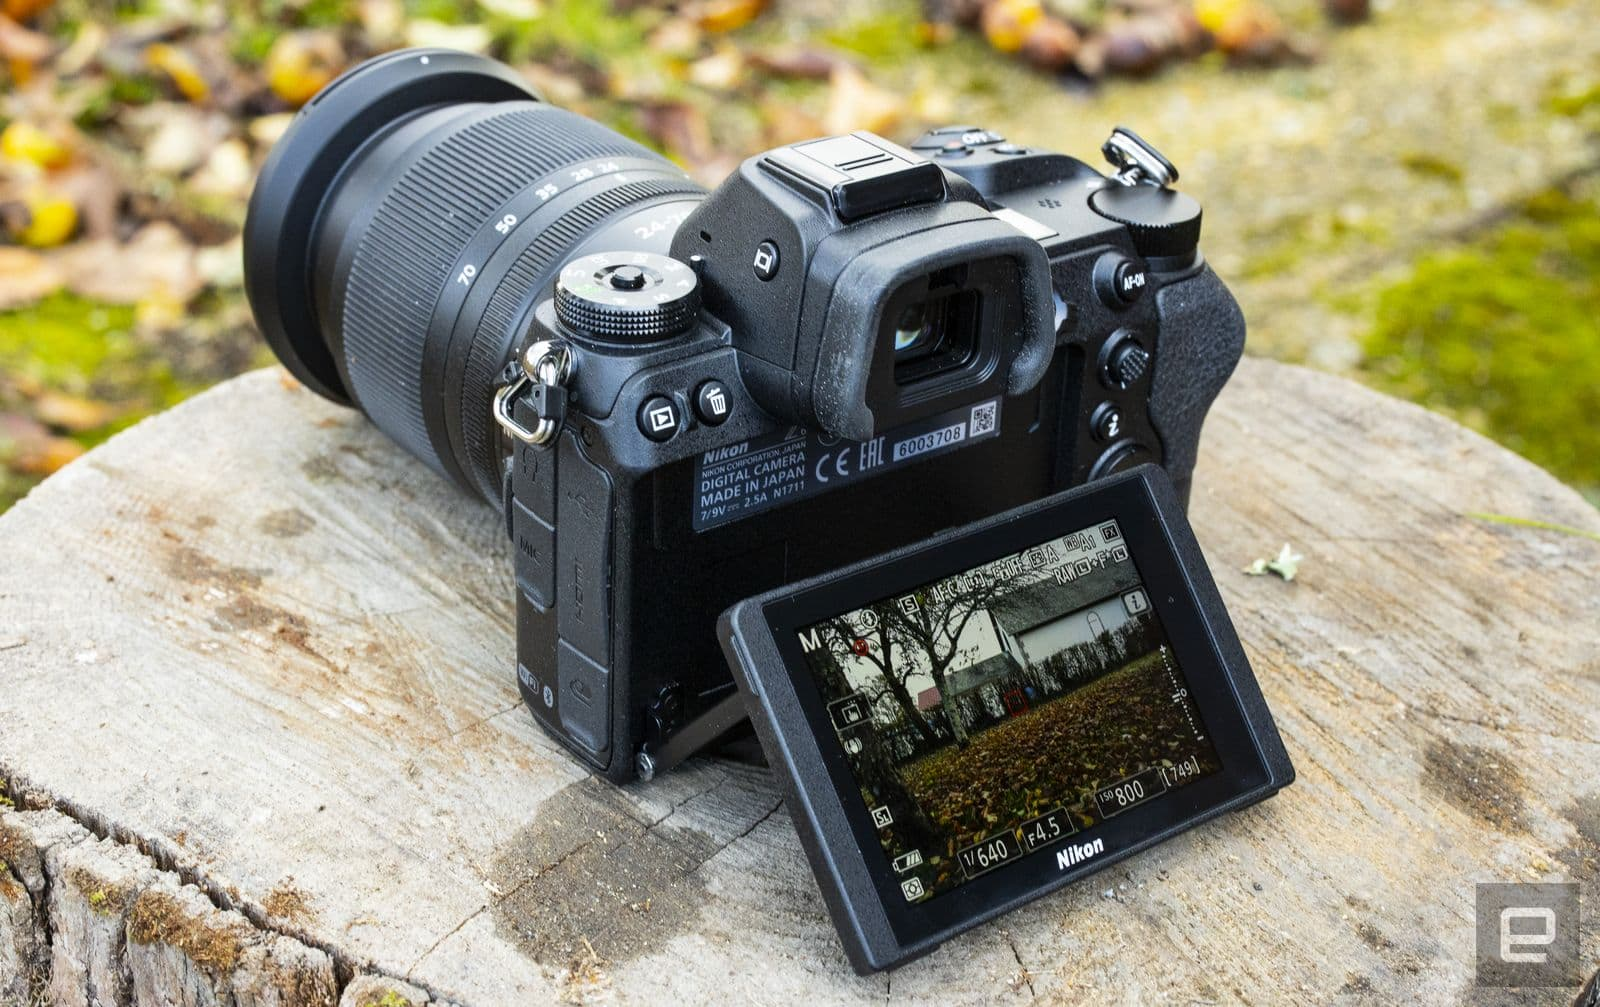 Nikon Z6 full-frame mirrorless camera